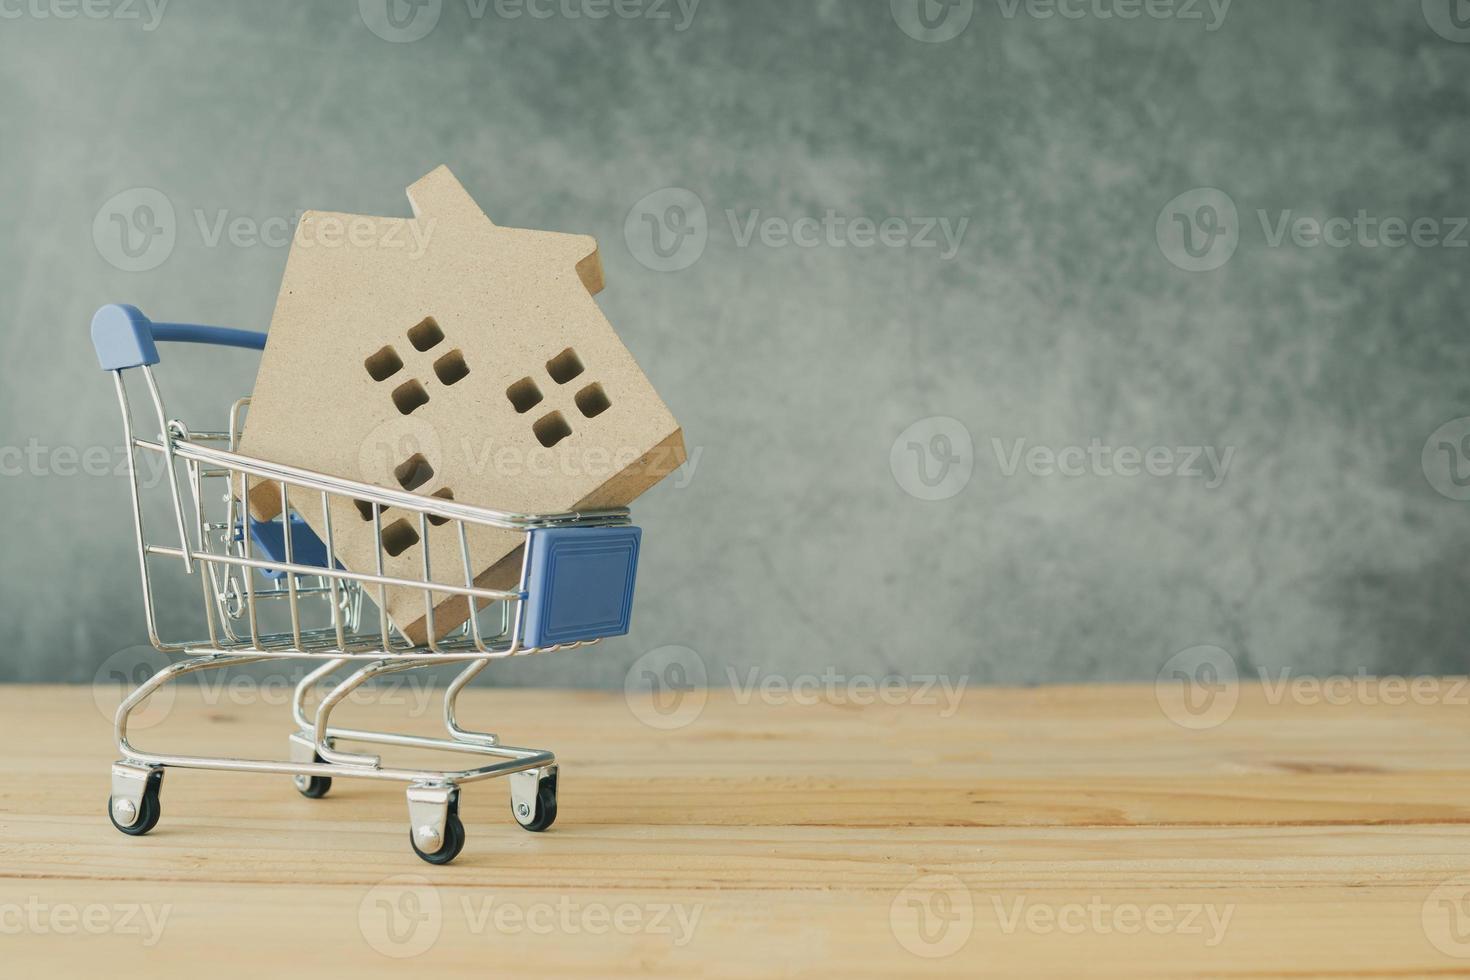 casa modelo en un carrito de compras foto